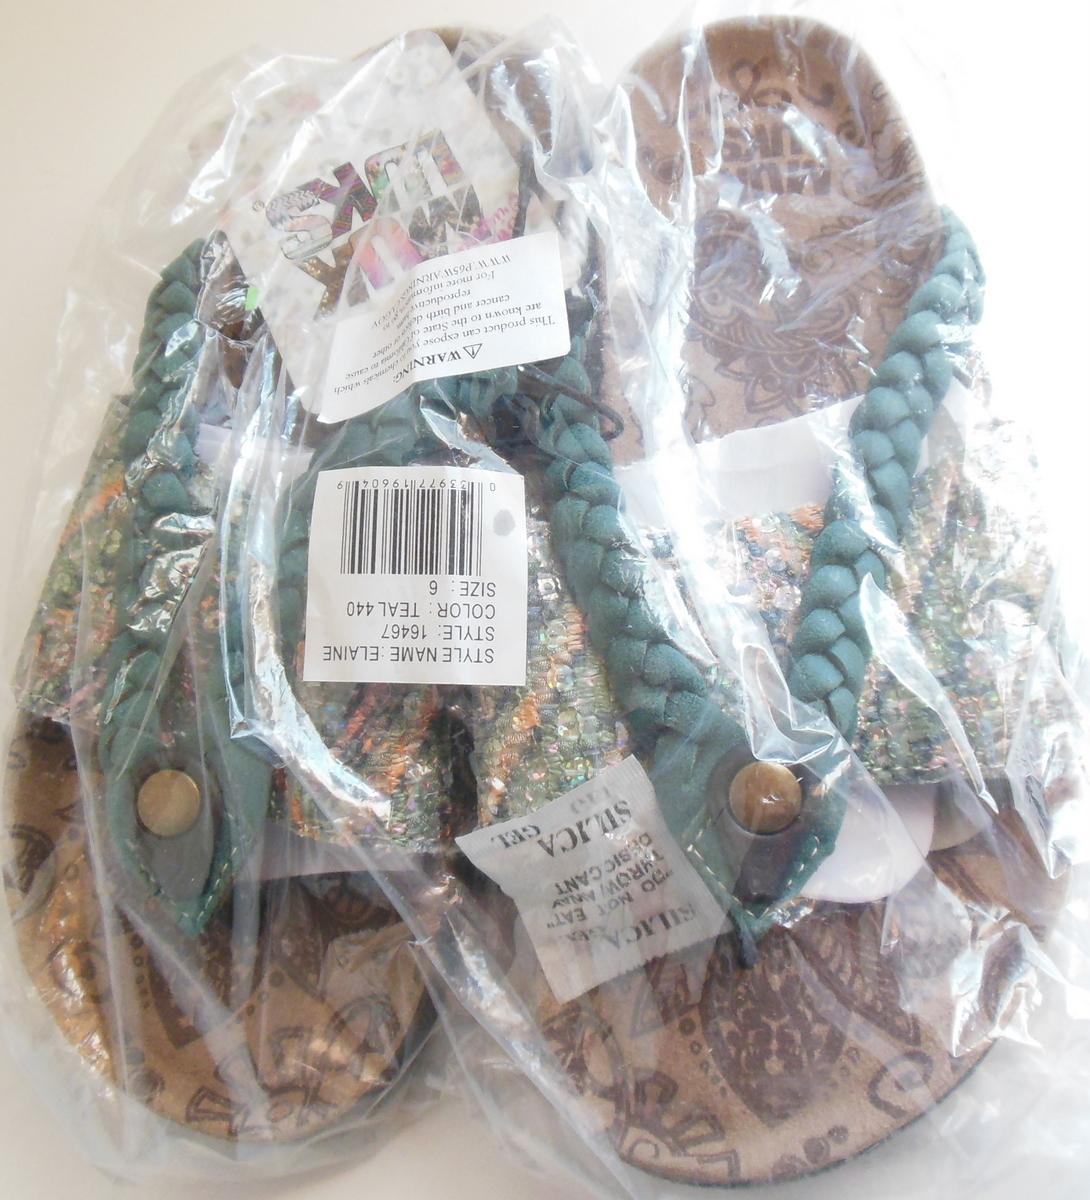 c89868391e3 Dscn3032. Dscn3032. Previous. Ladies Muk Luks Sandal 6 Style Elaine Teal  Sequined Braided Thumb Toe Sandals